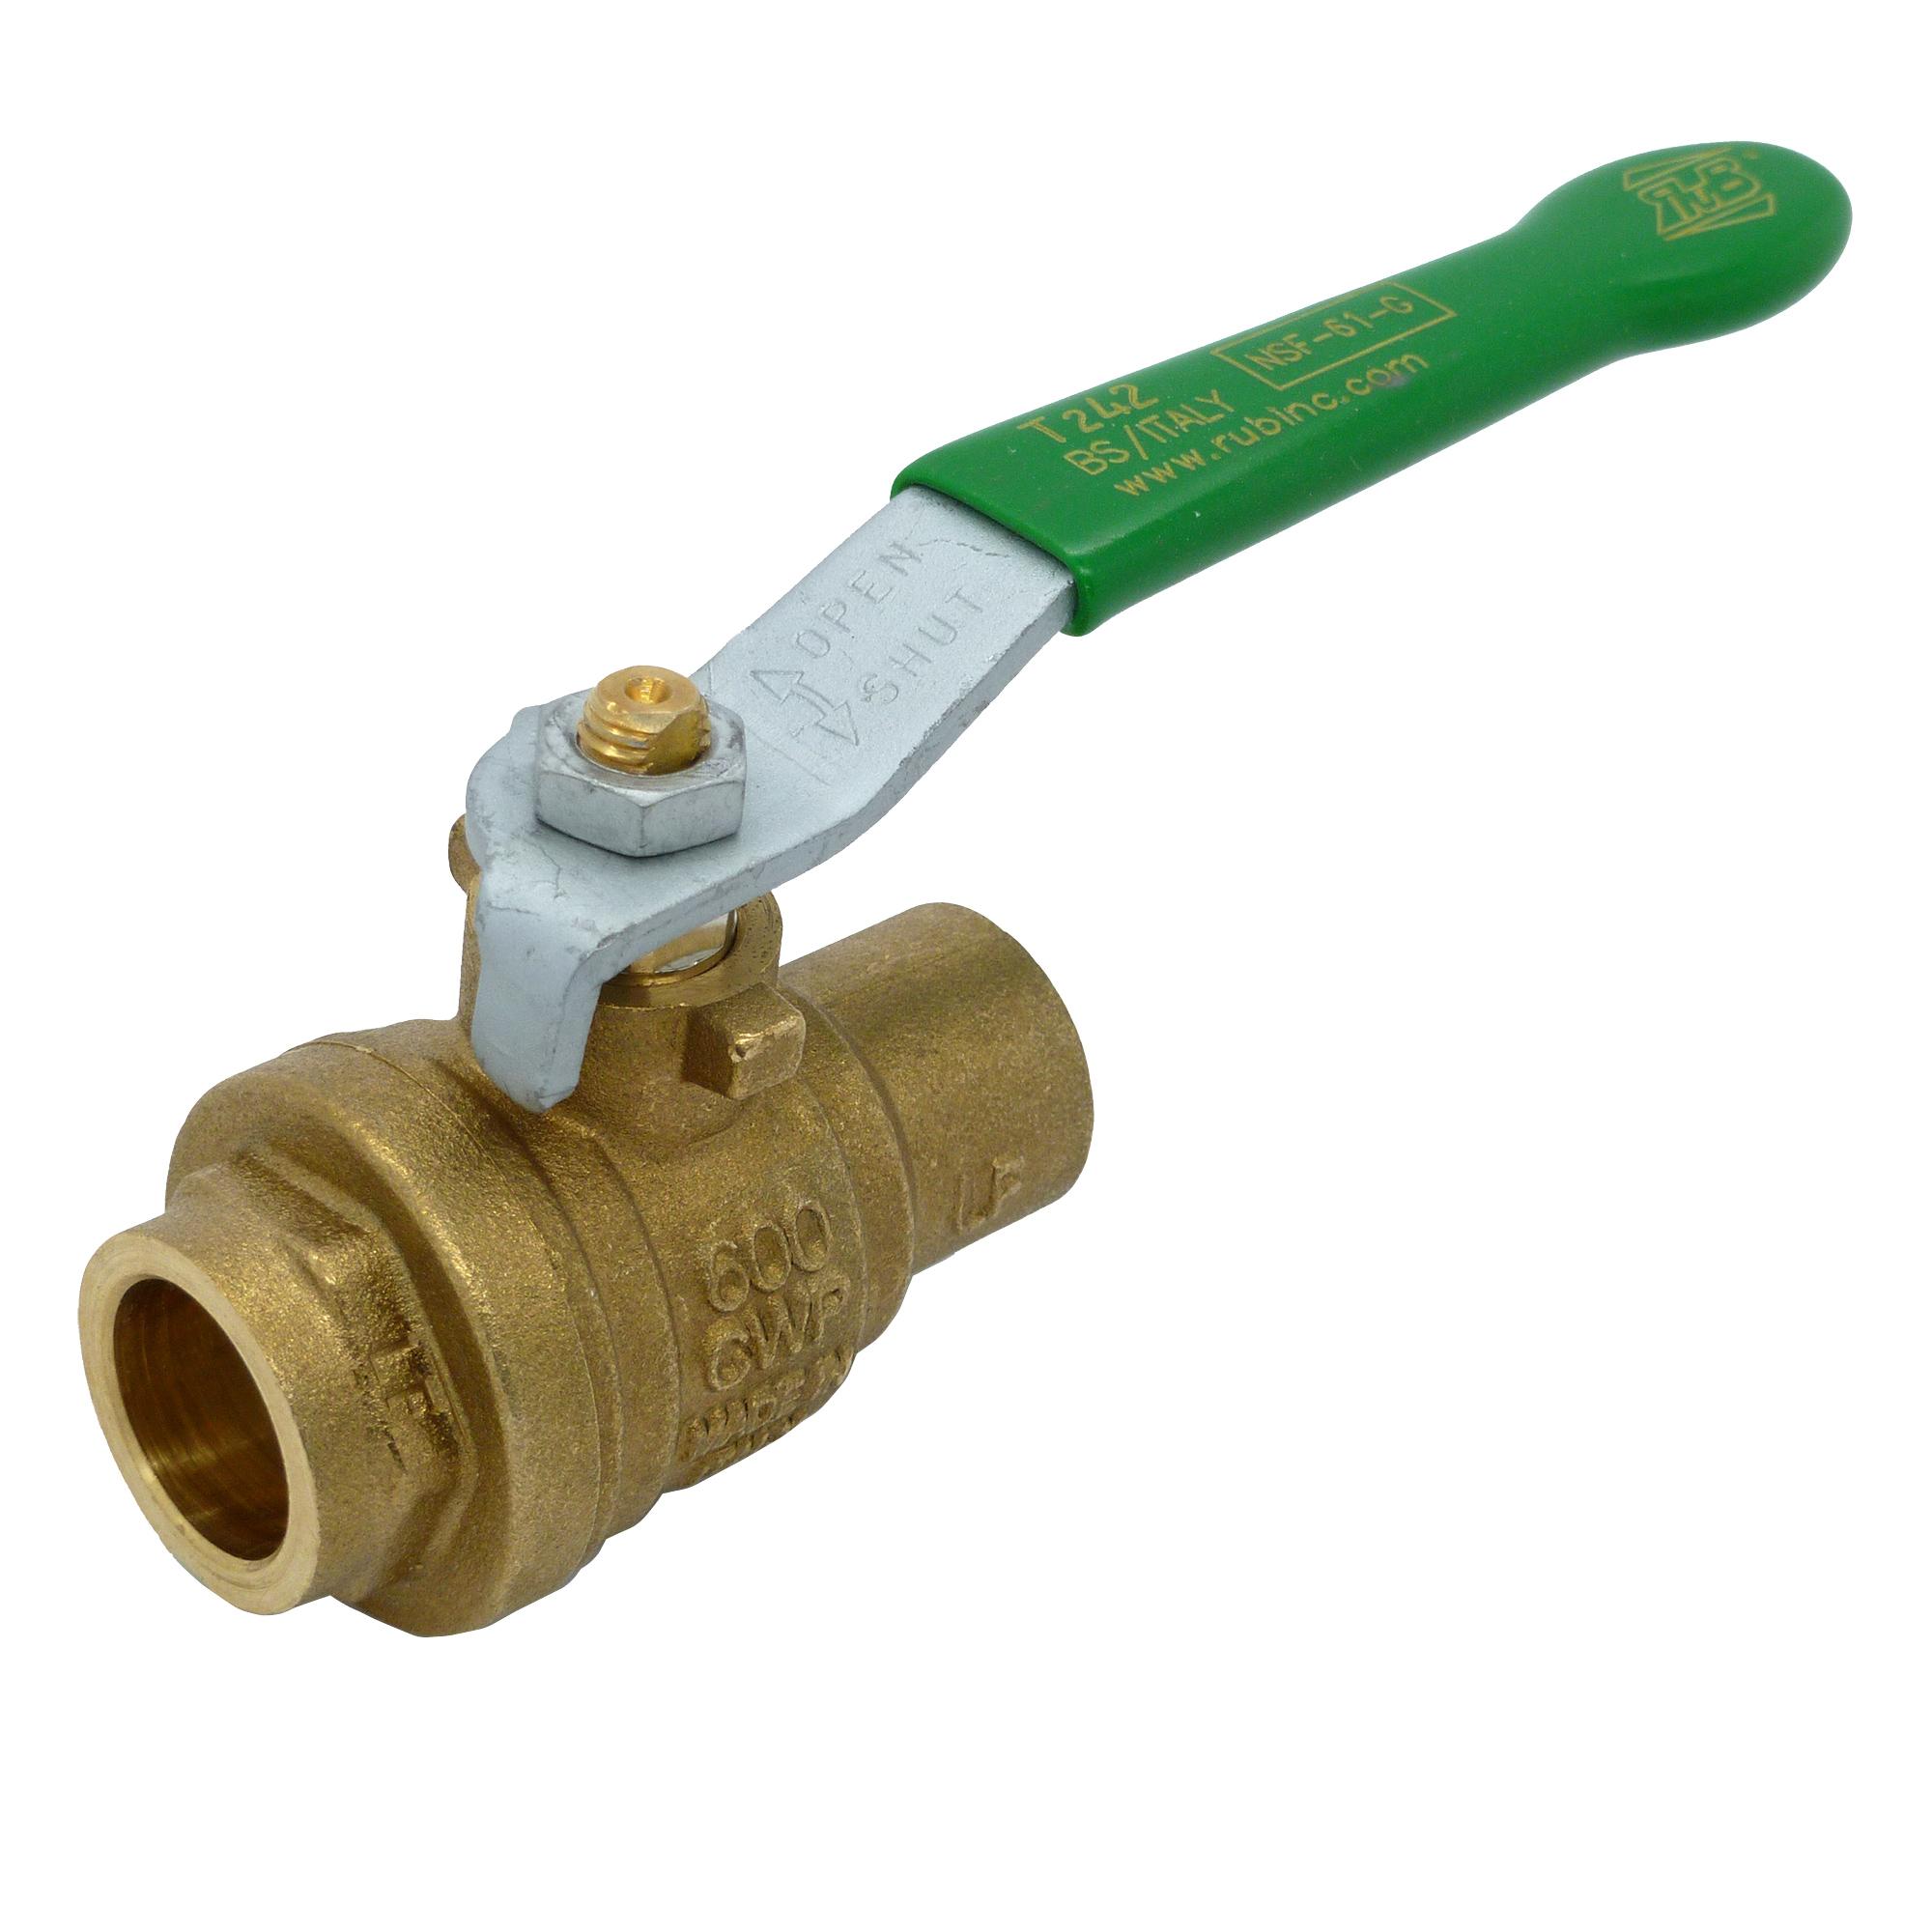 pack 1 2 rub brass ball valve   reboot pack parts   shop